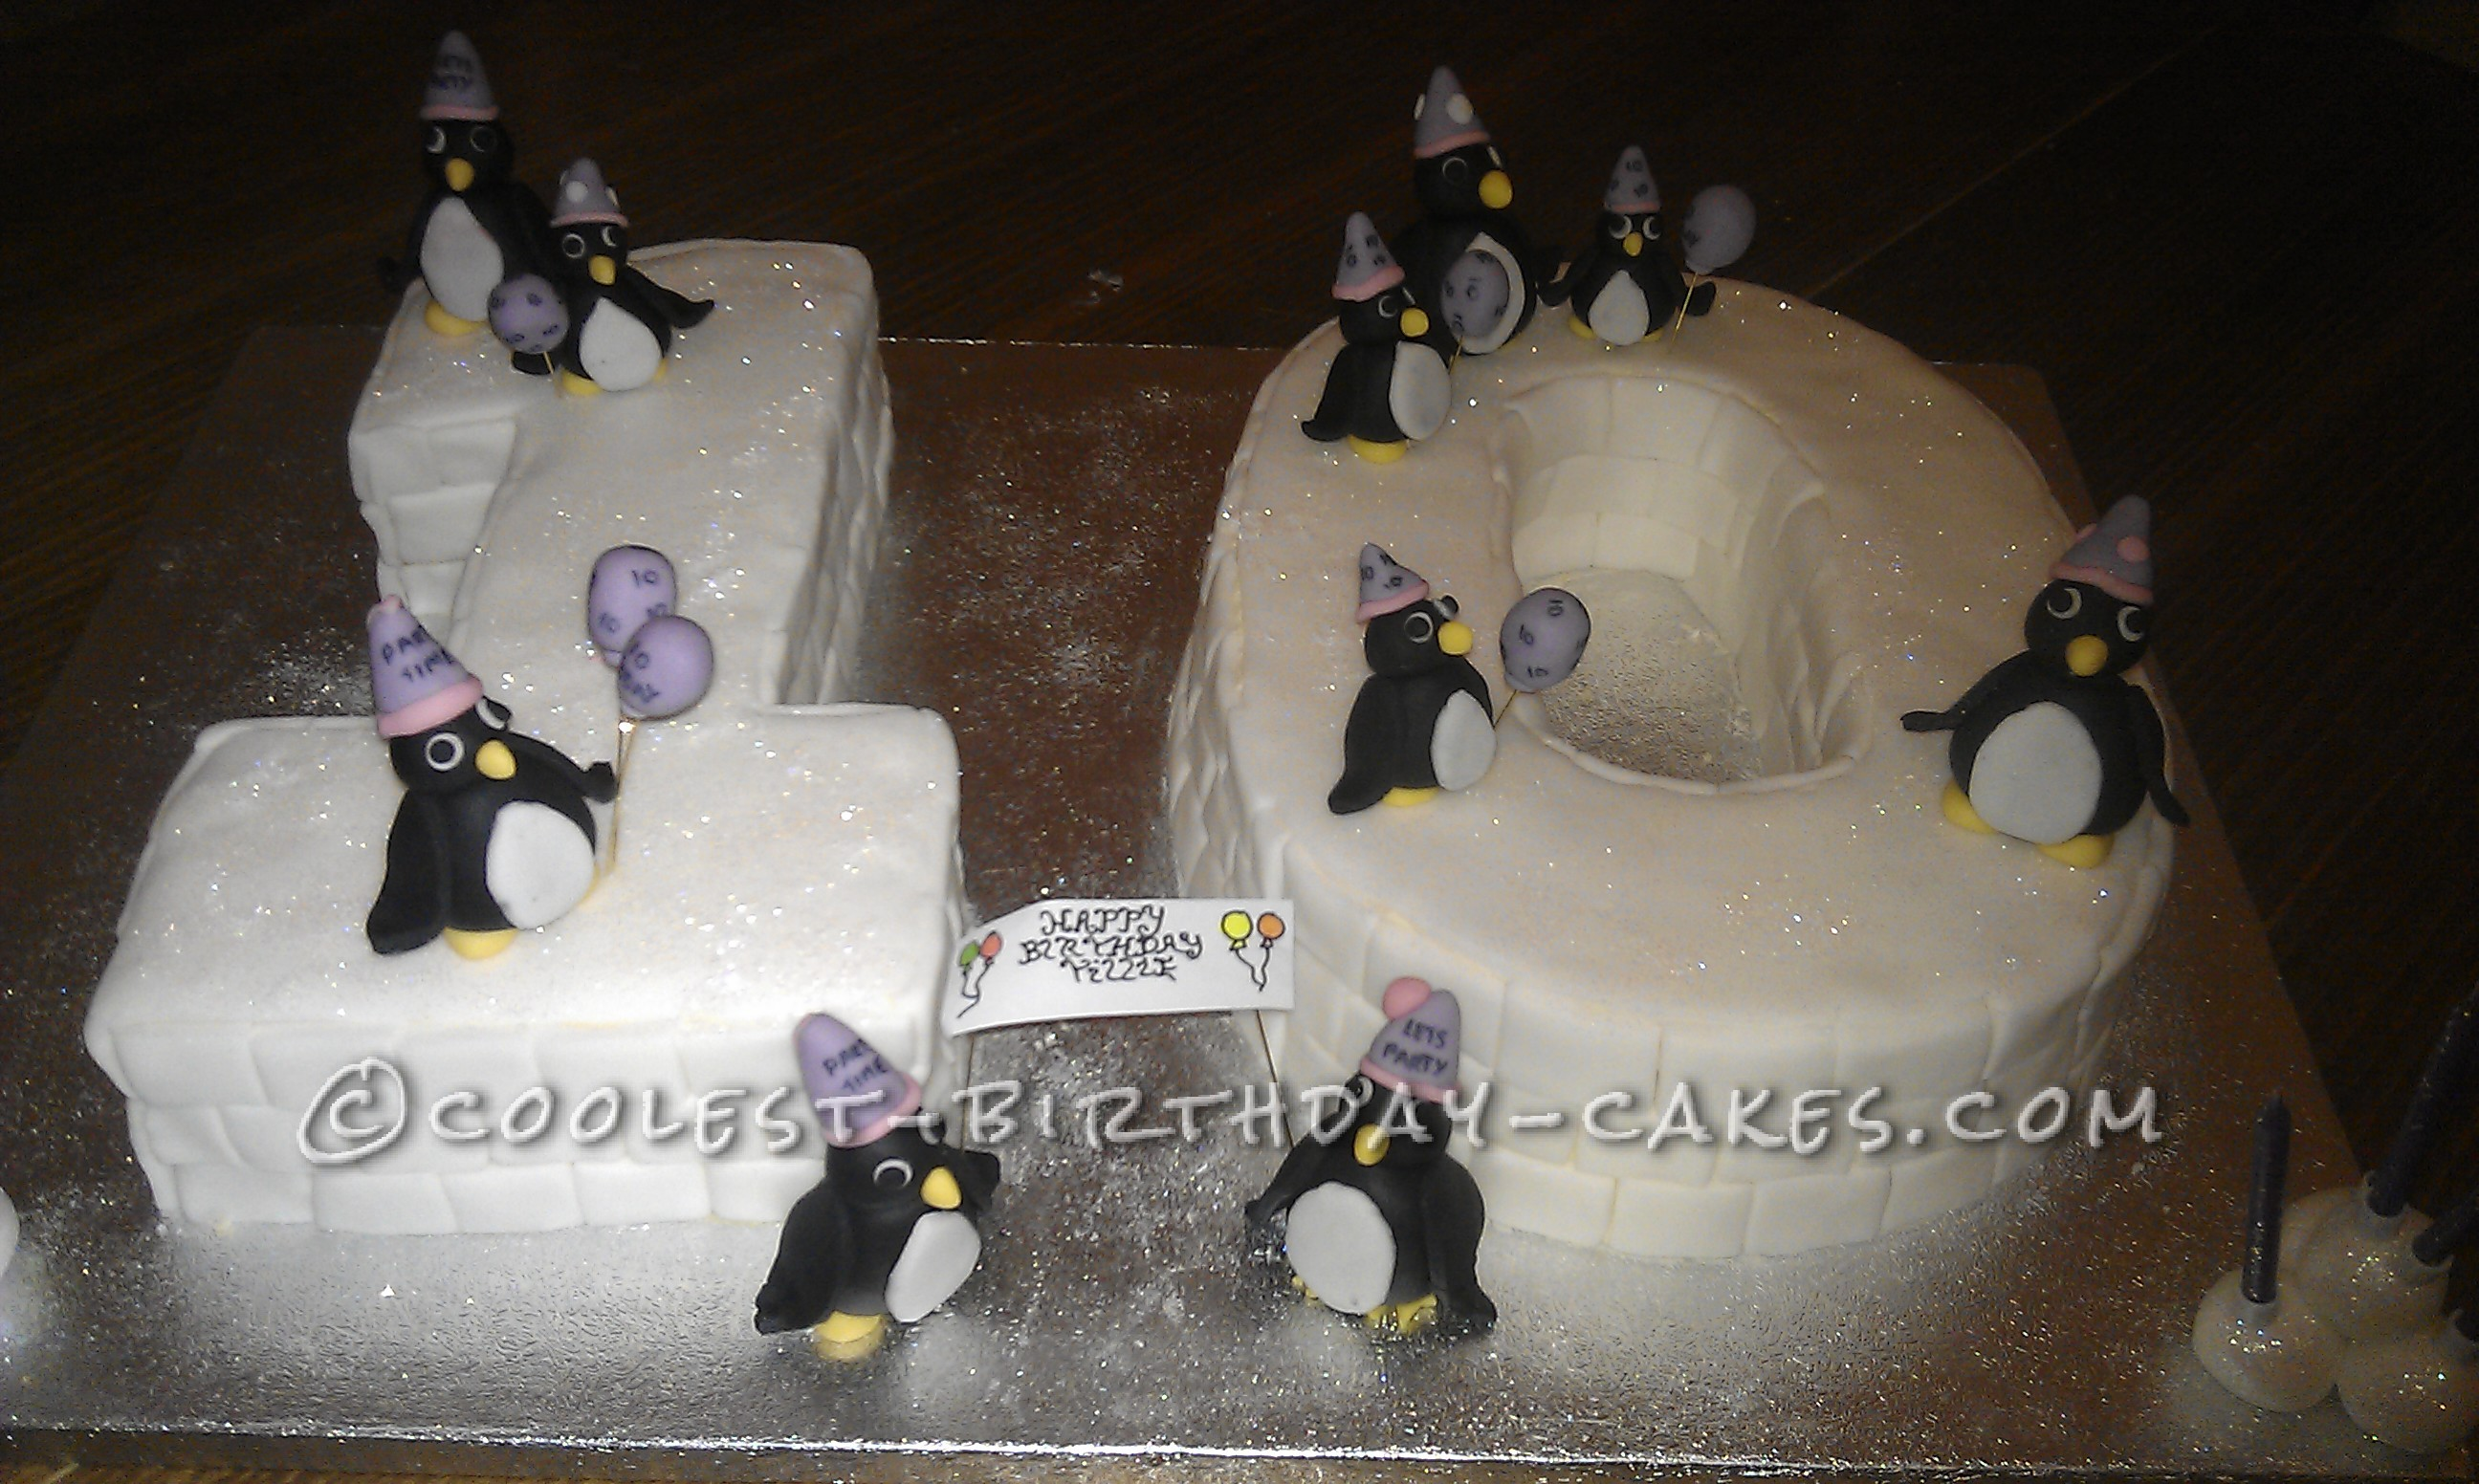 Coolest Penguin Birthday Cake